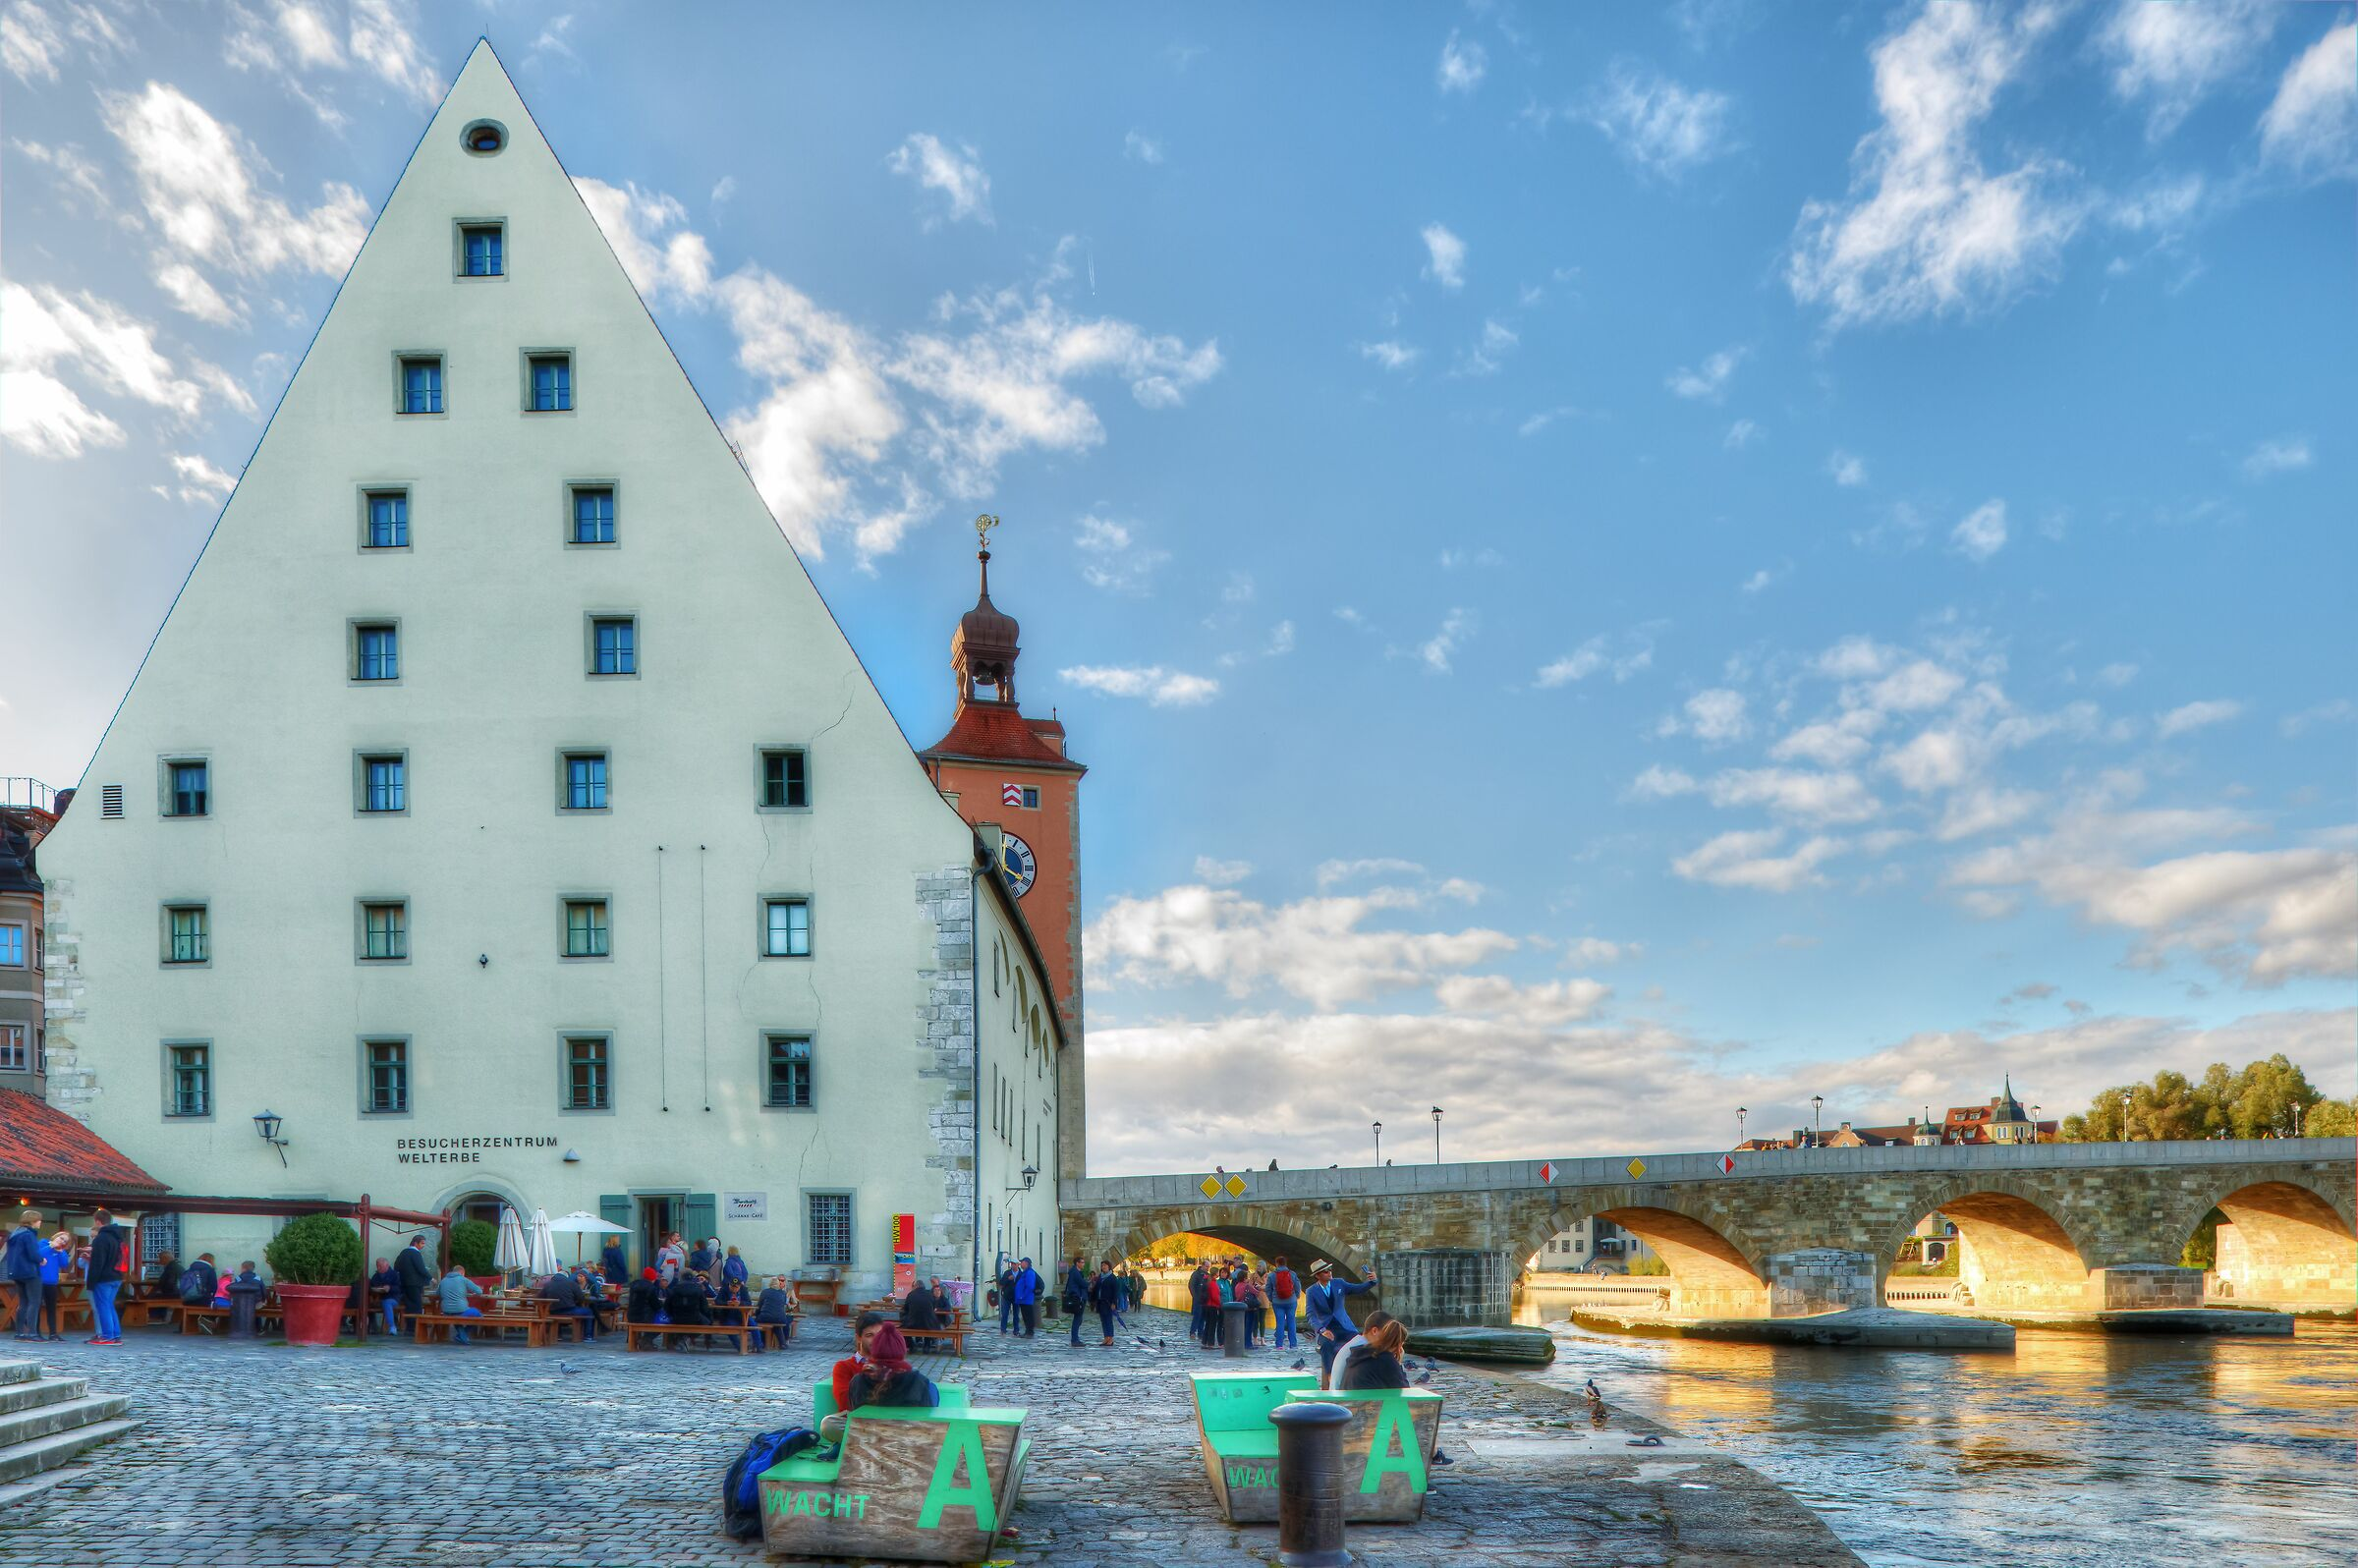 Old Salt Storage and Stone Bridge; Regensburg, Germany...